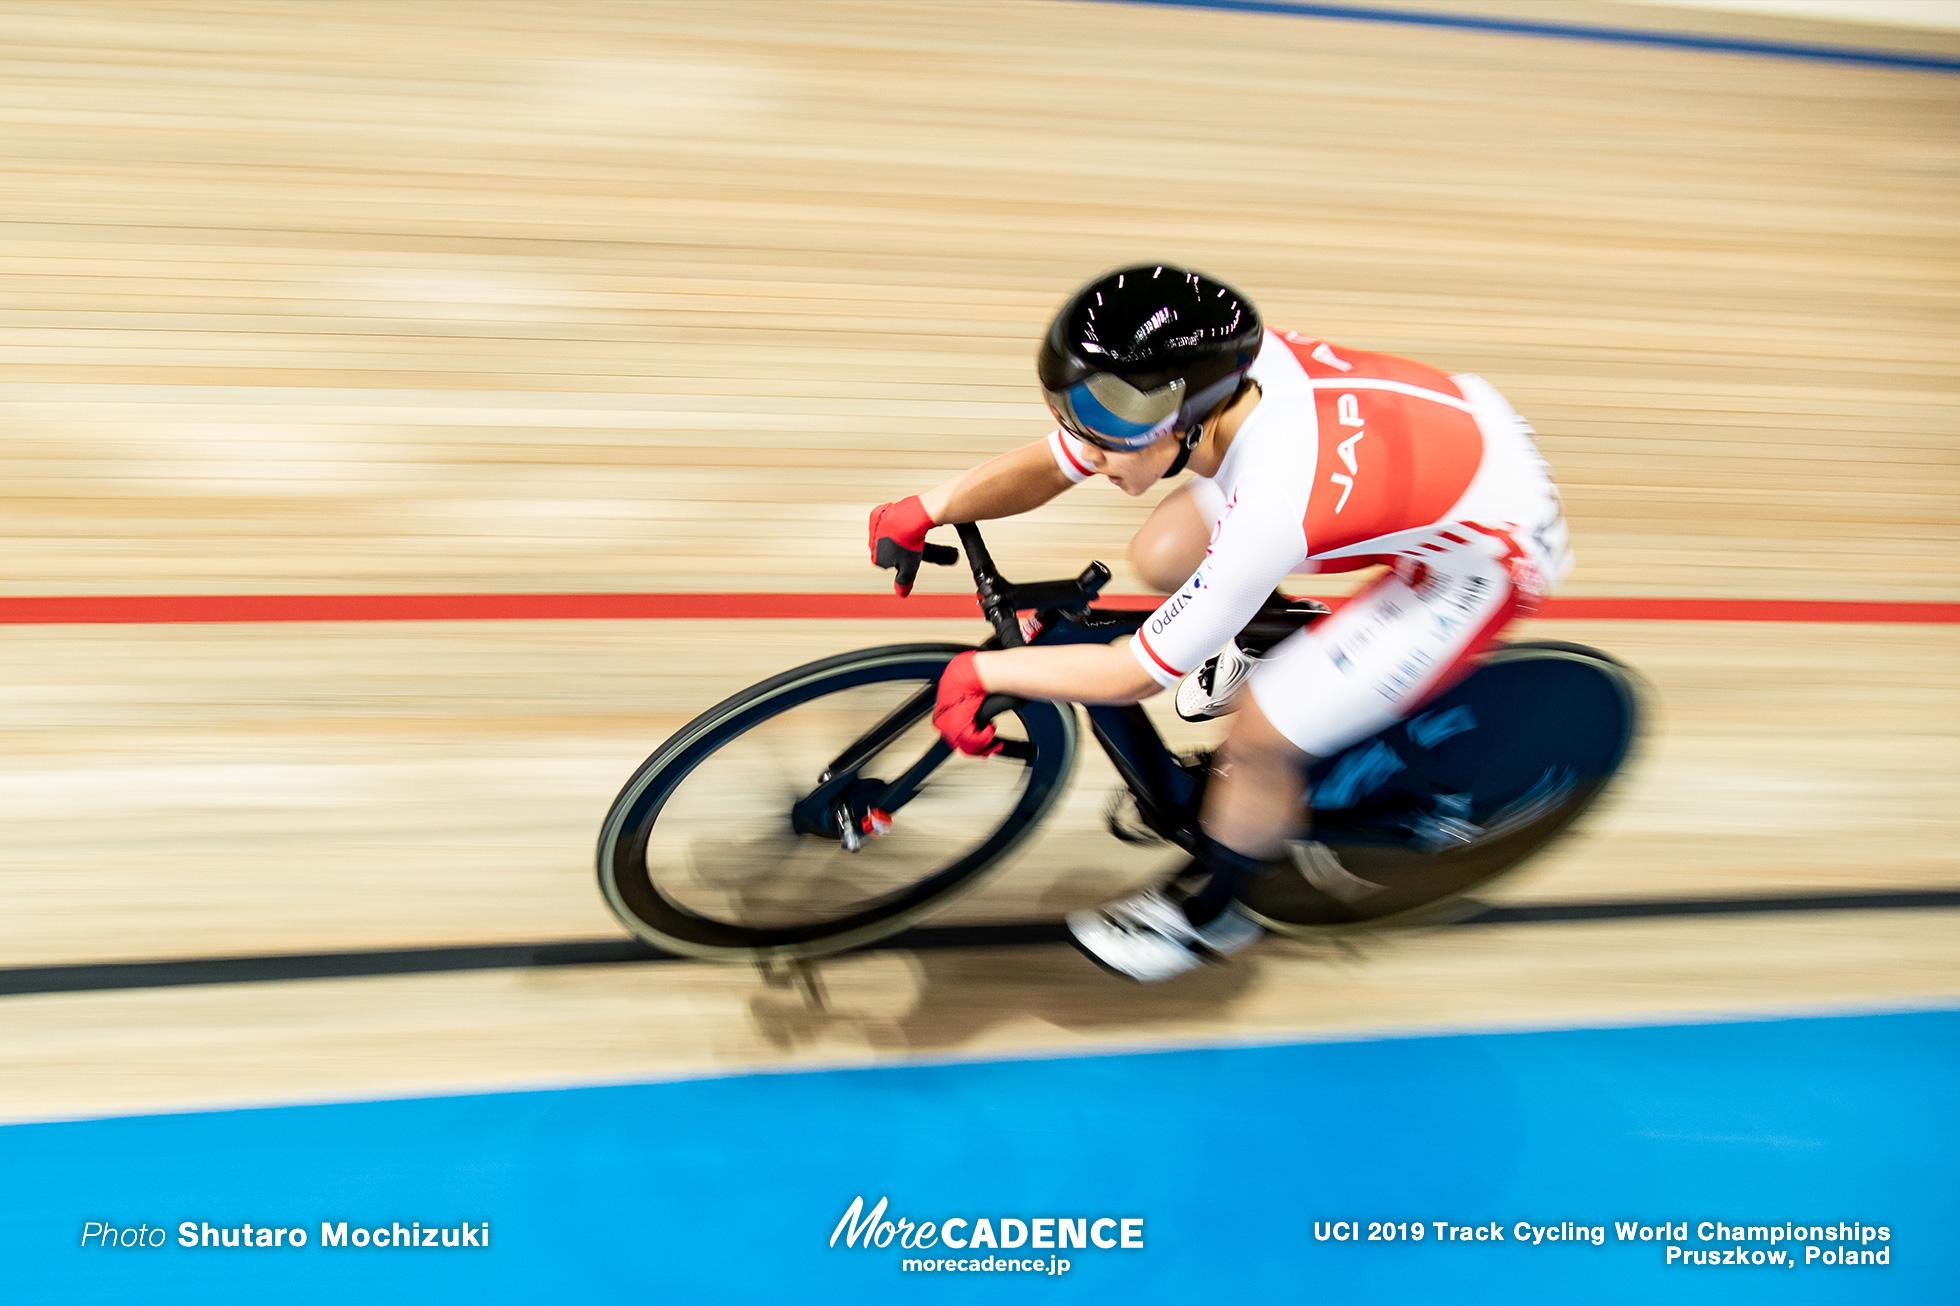 Women's Omnium Tempo Race / 2019 Track Cycling World Championships Pruszków, Poland